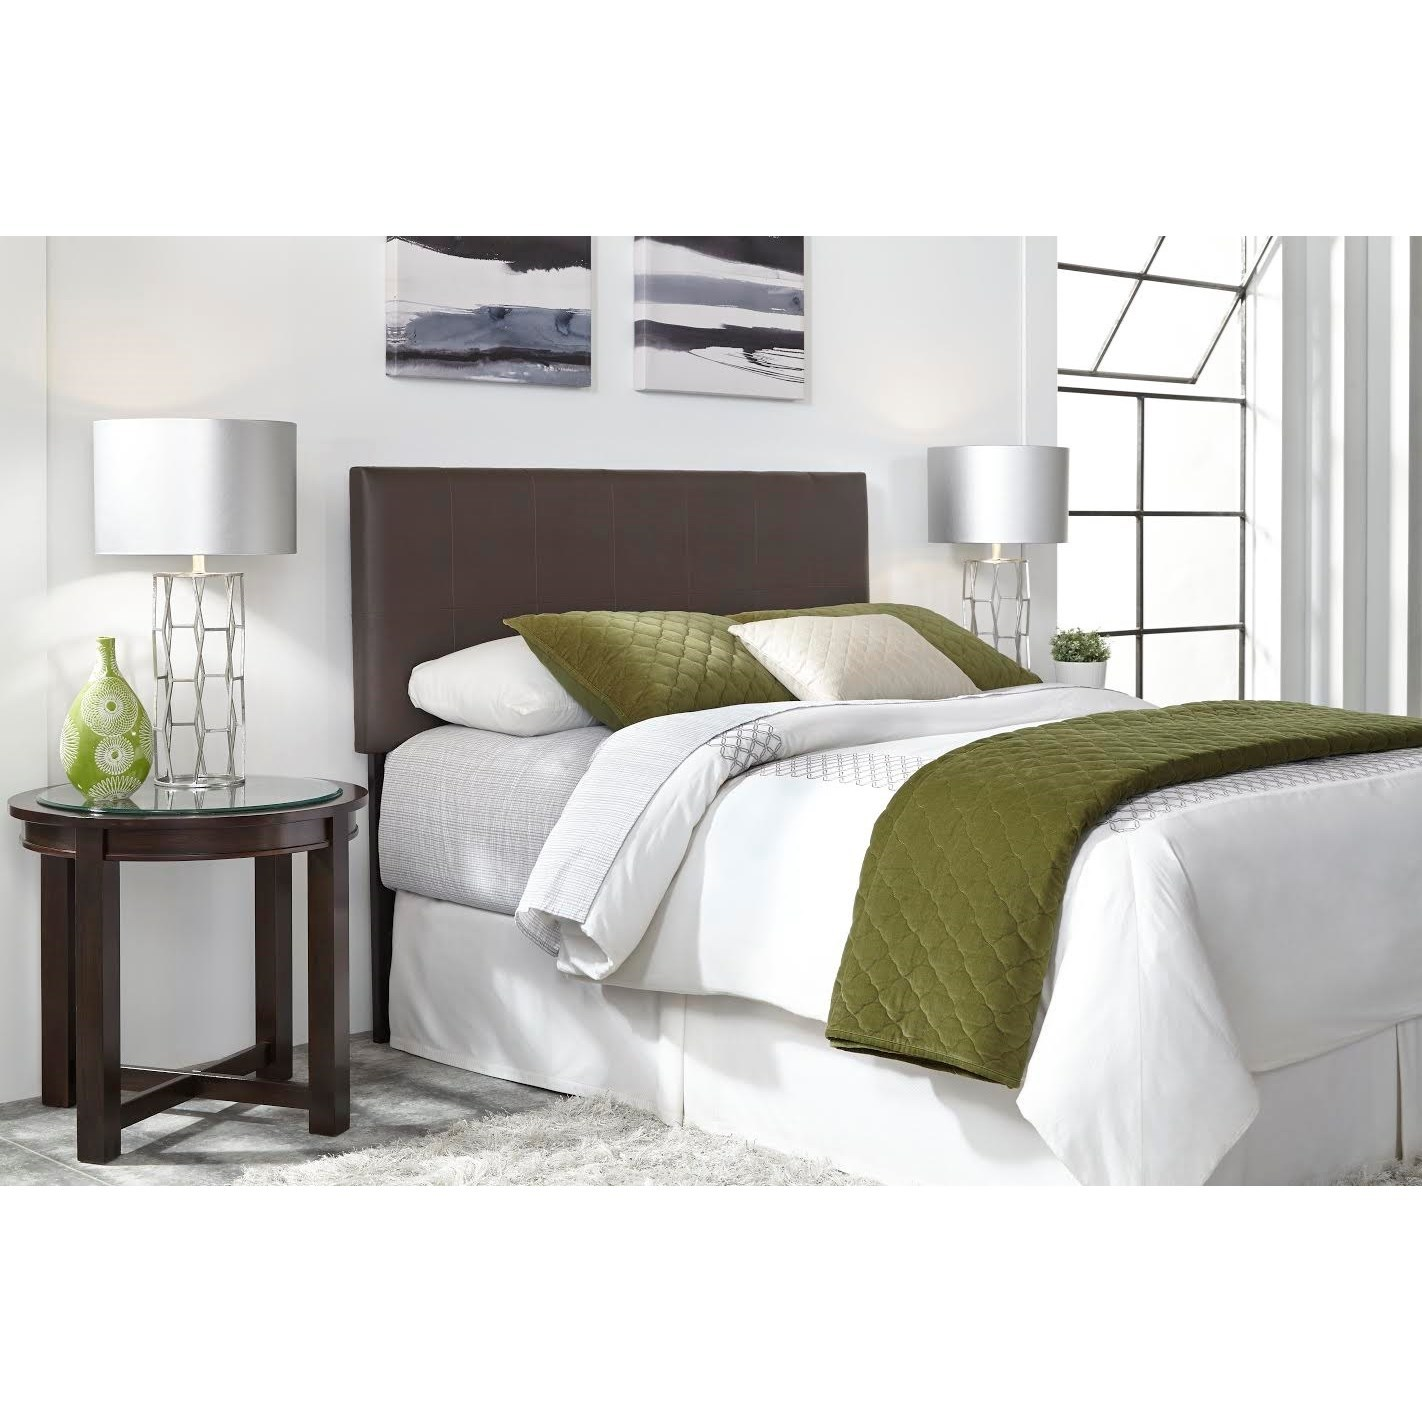 Fashion Bed Group Upholstered Bronson King Cal King